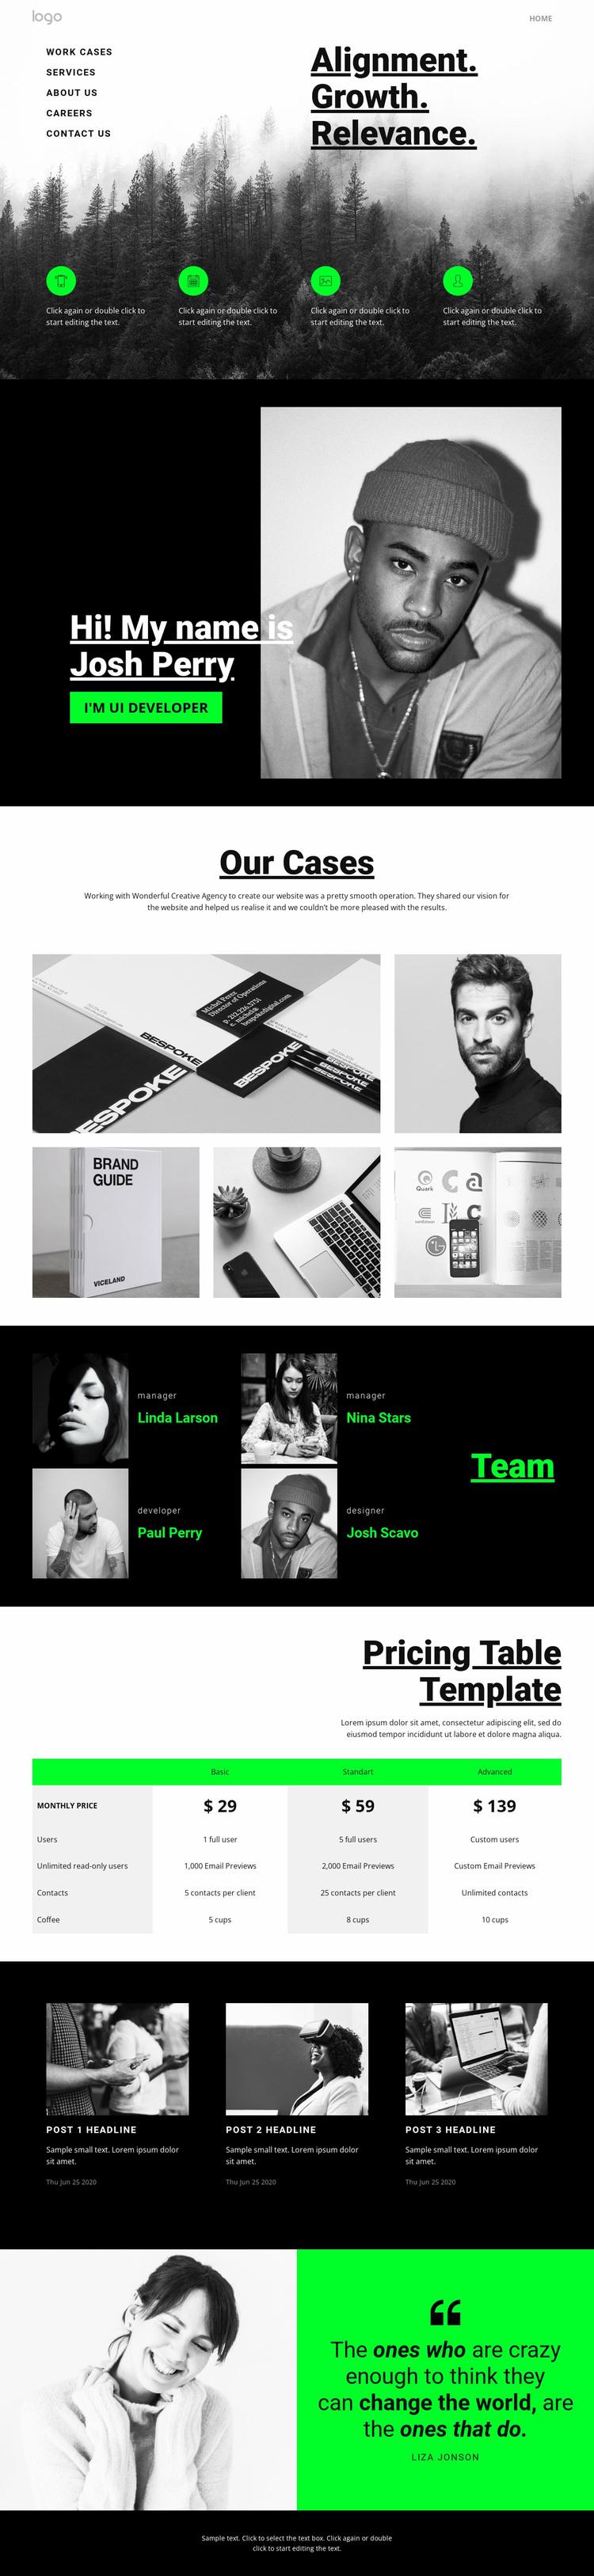 Relevance in business Website Design